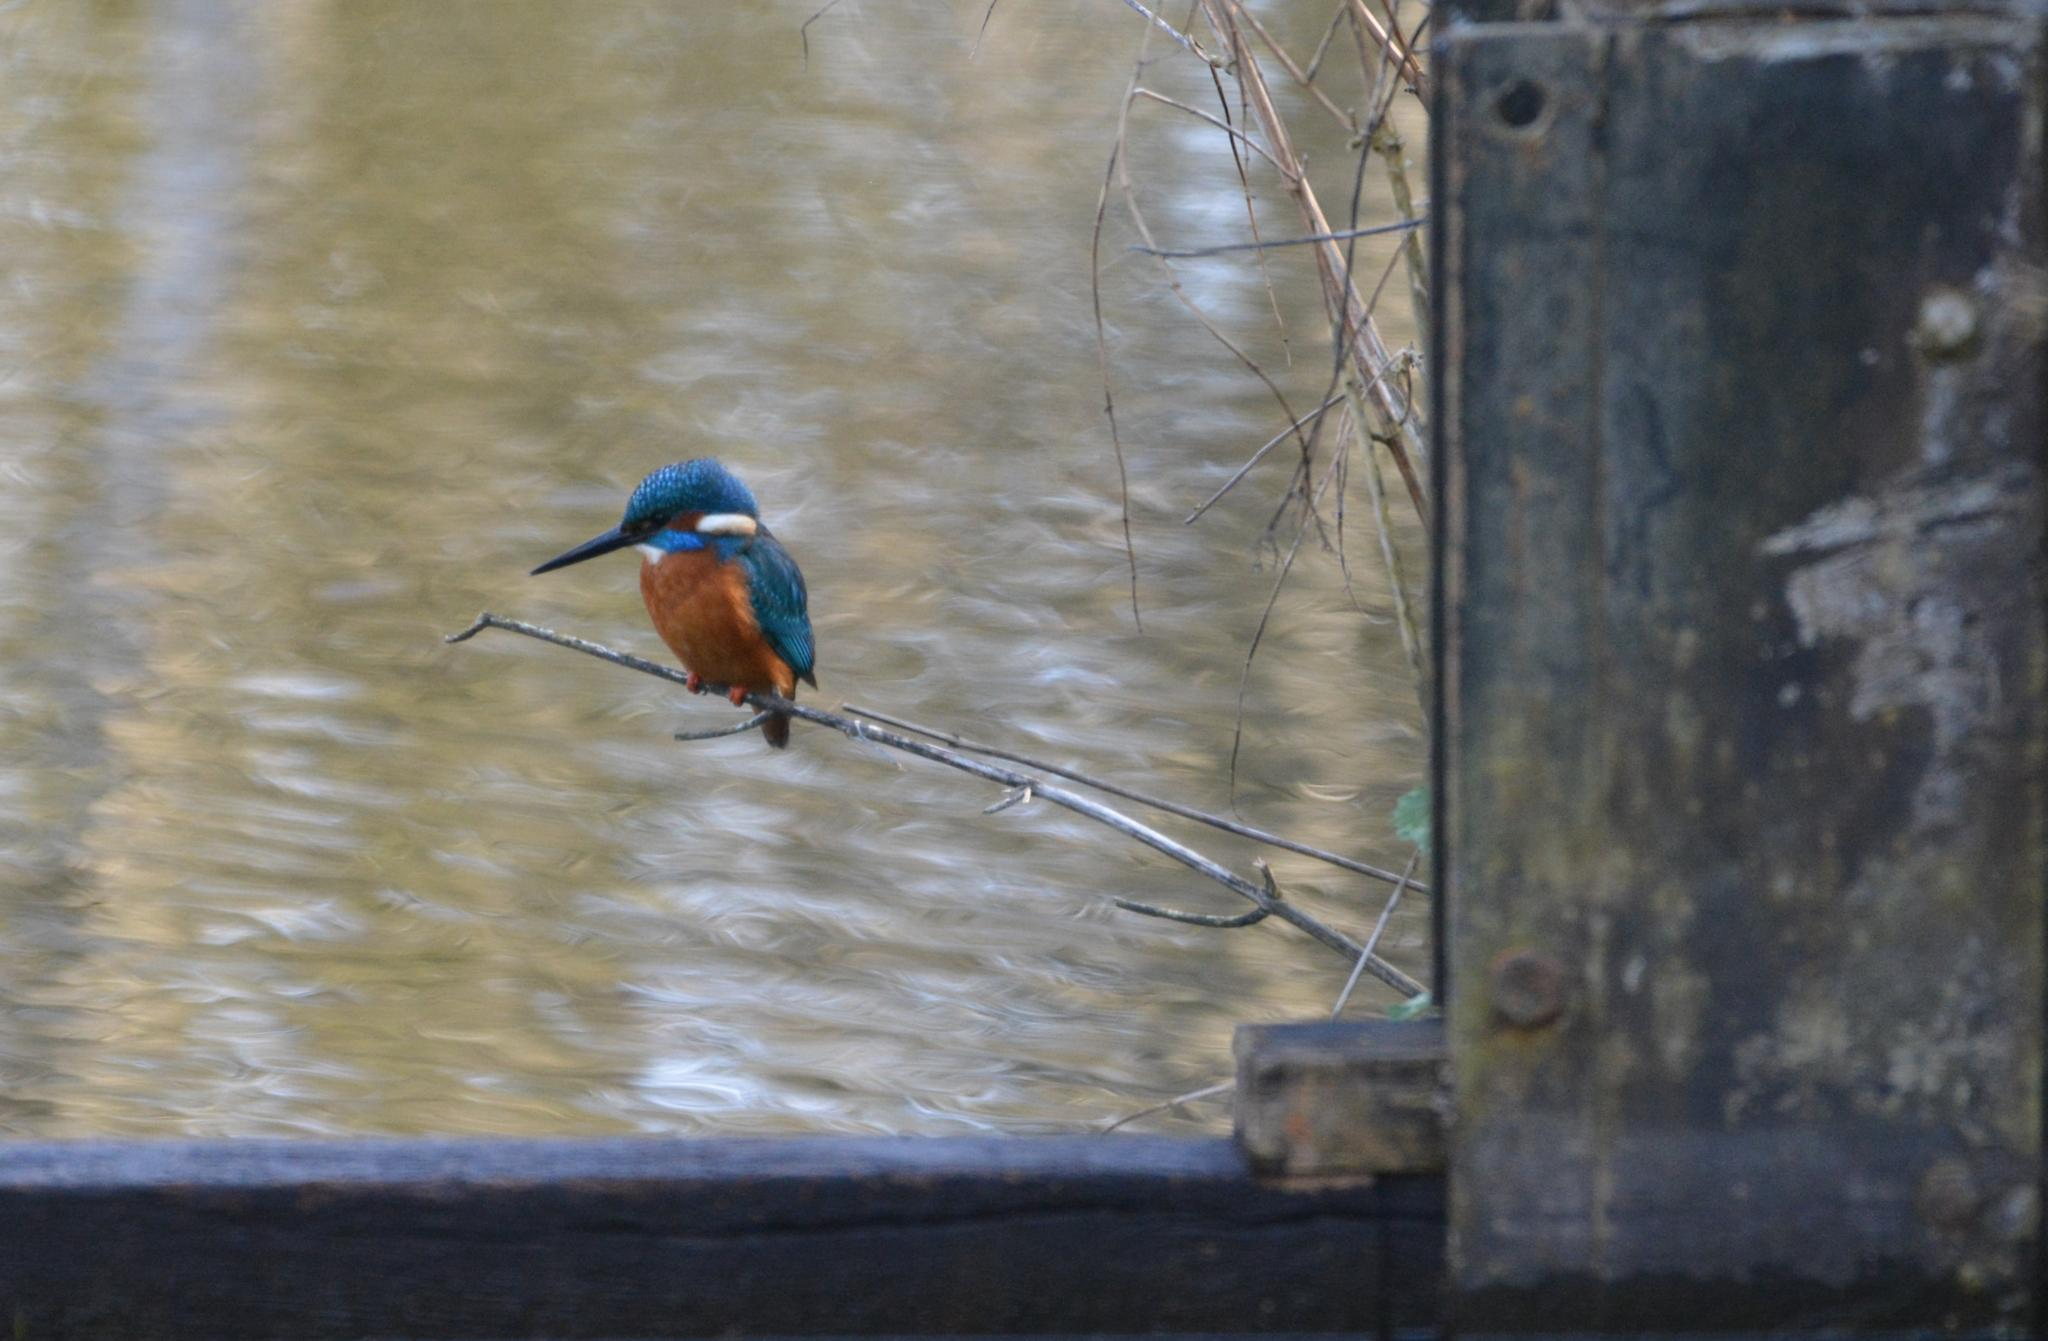 Kingfisher by paul.tyler.564